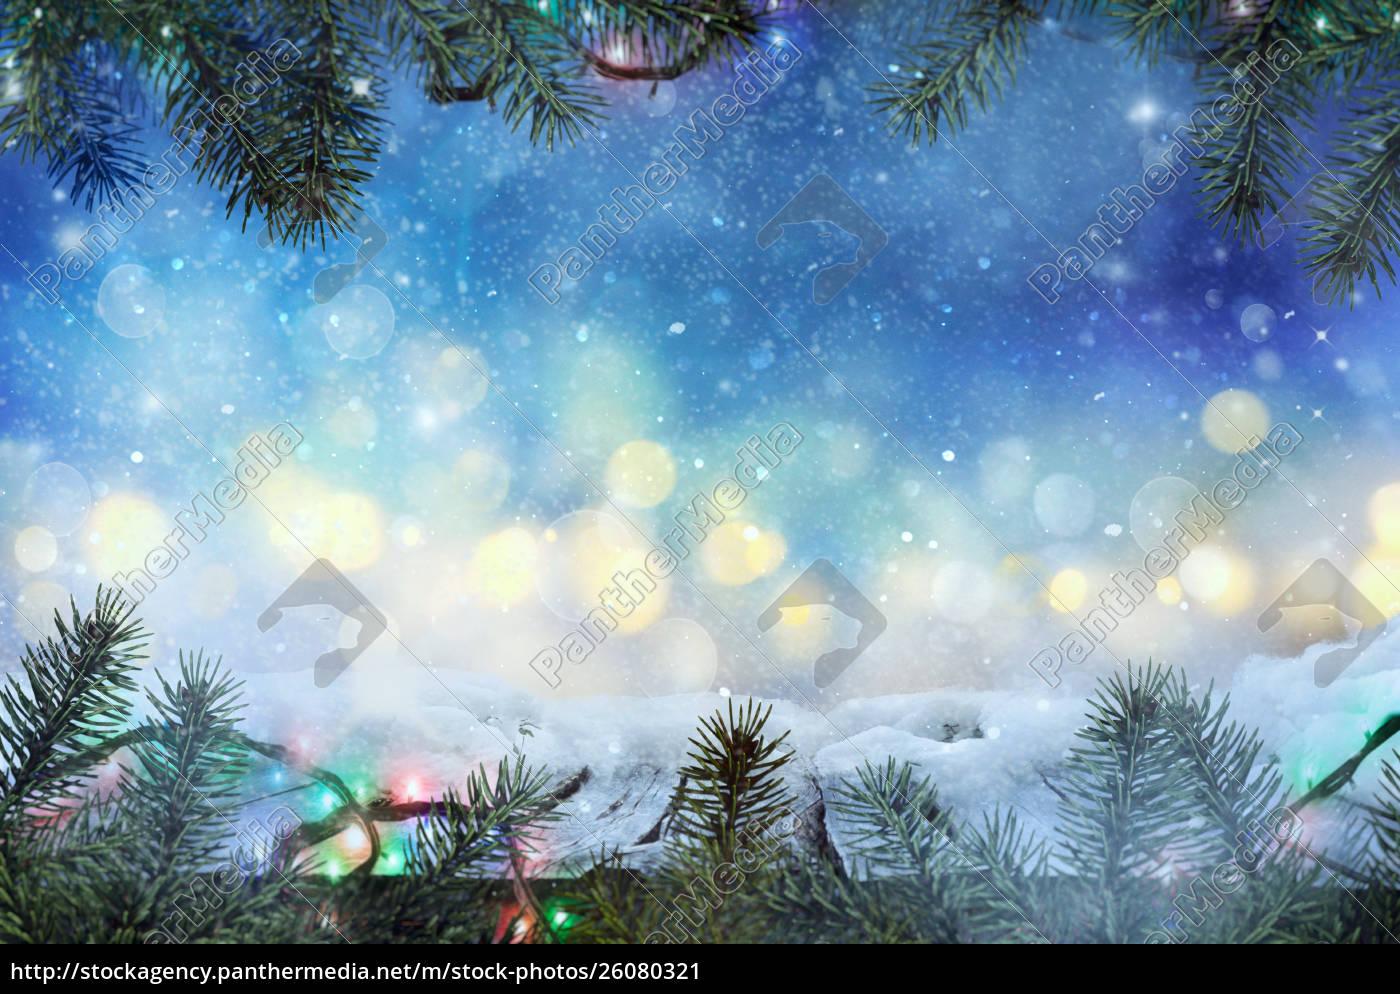 Christmas Background Design.Stock Photo 26080321 Winter Design Christmas Background With Frozen Table Blurred